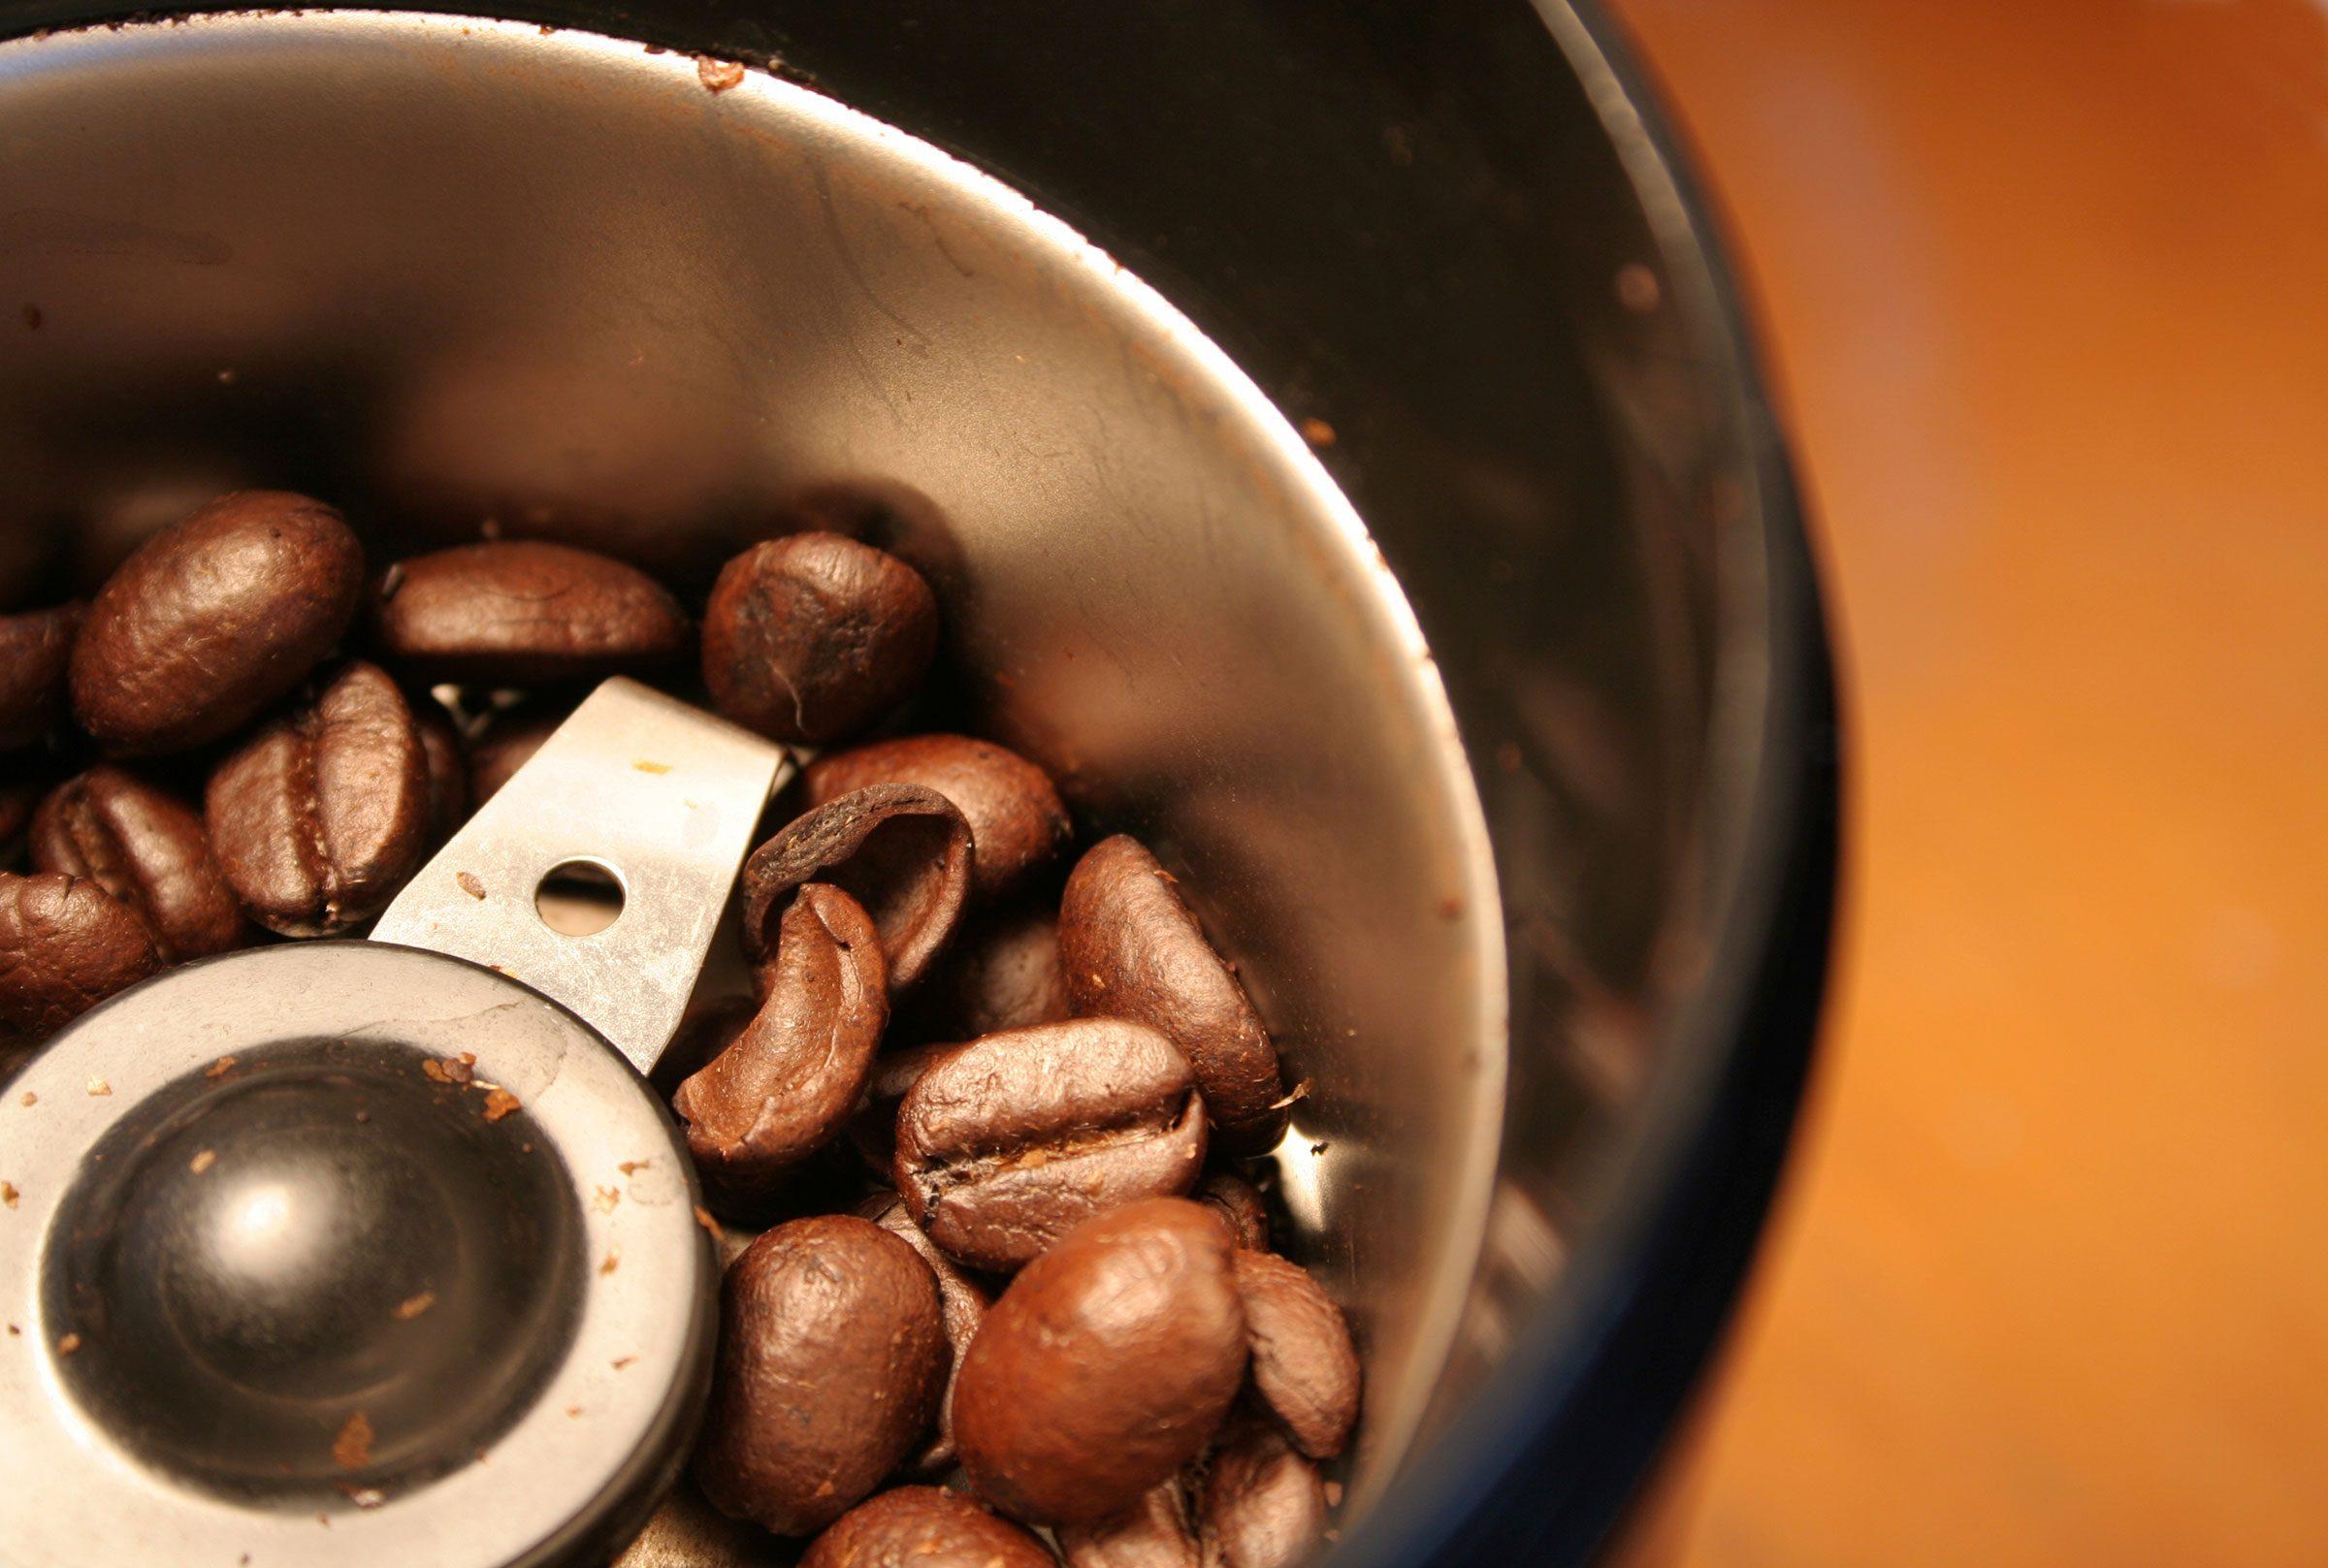 A Coffee Grinder Trick